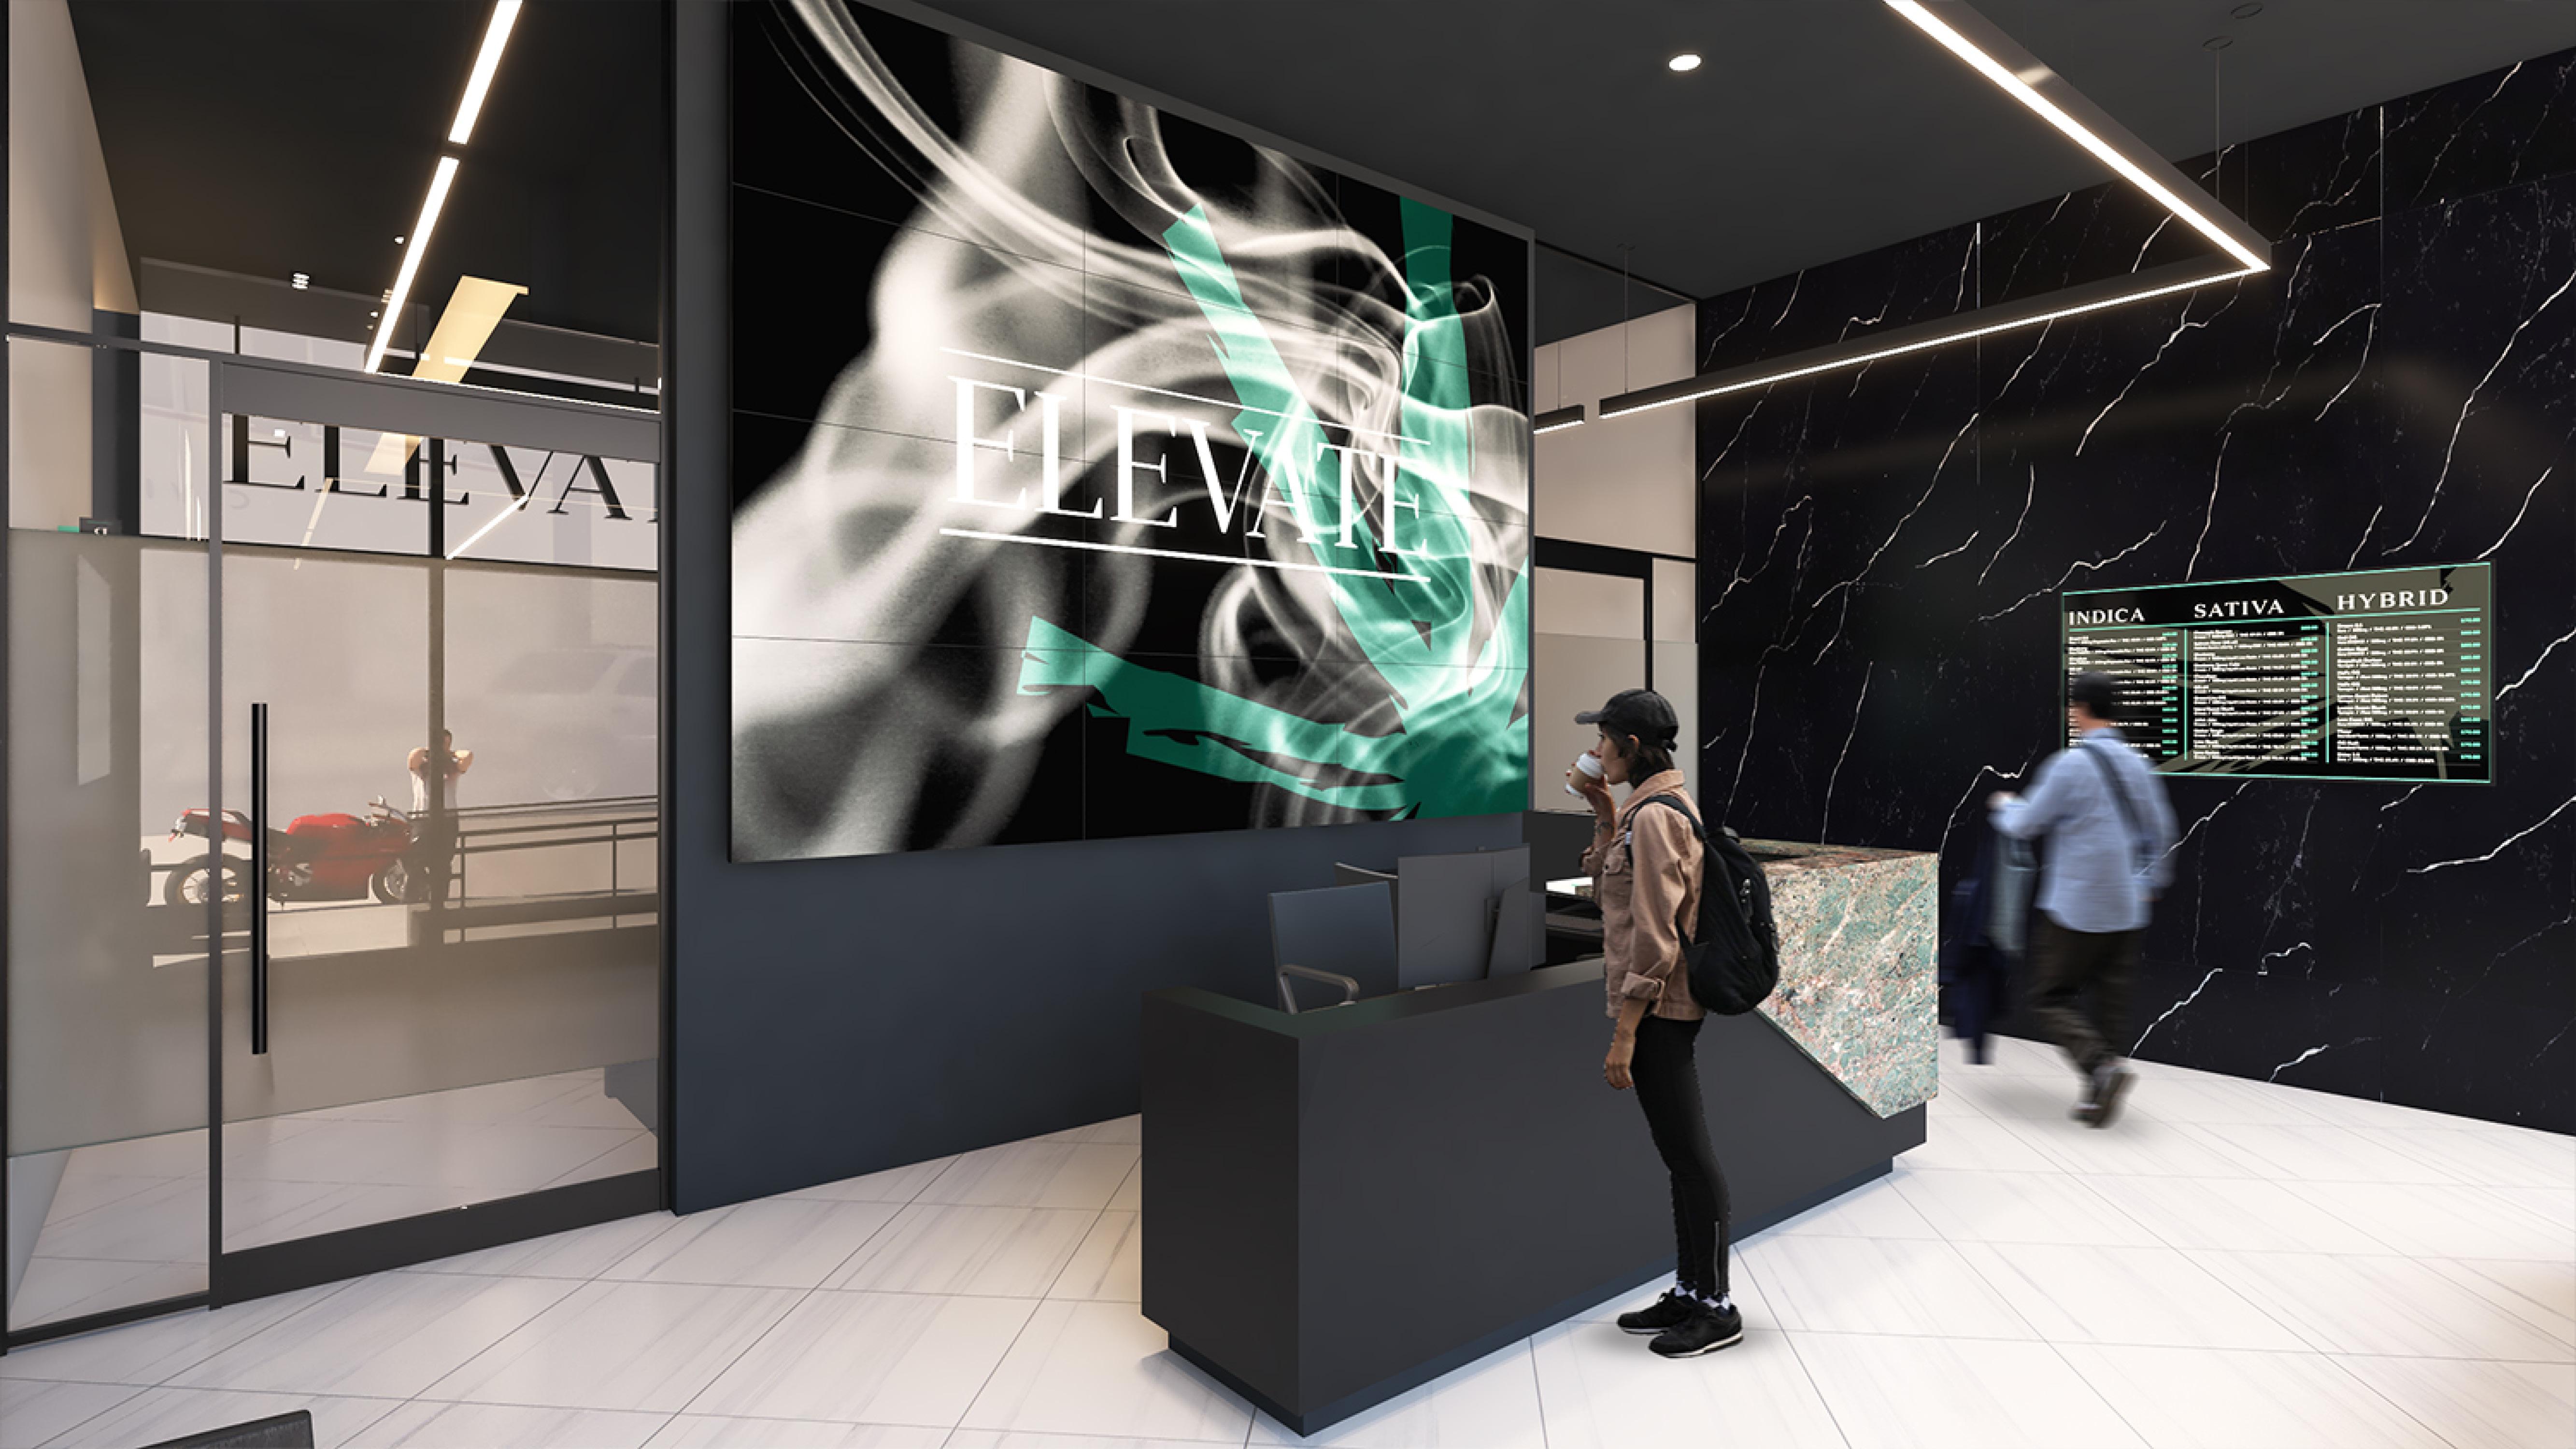 Elevate Dispensary in Oxnard CA. Interior Dispensary Design by High Road Studio, coming soon.